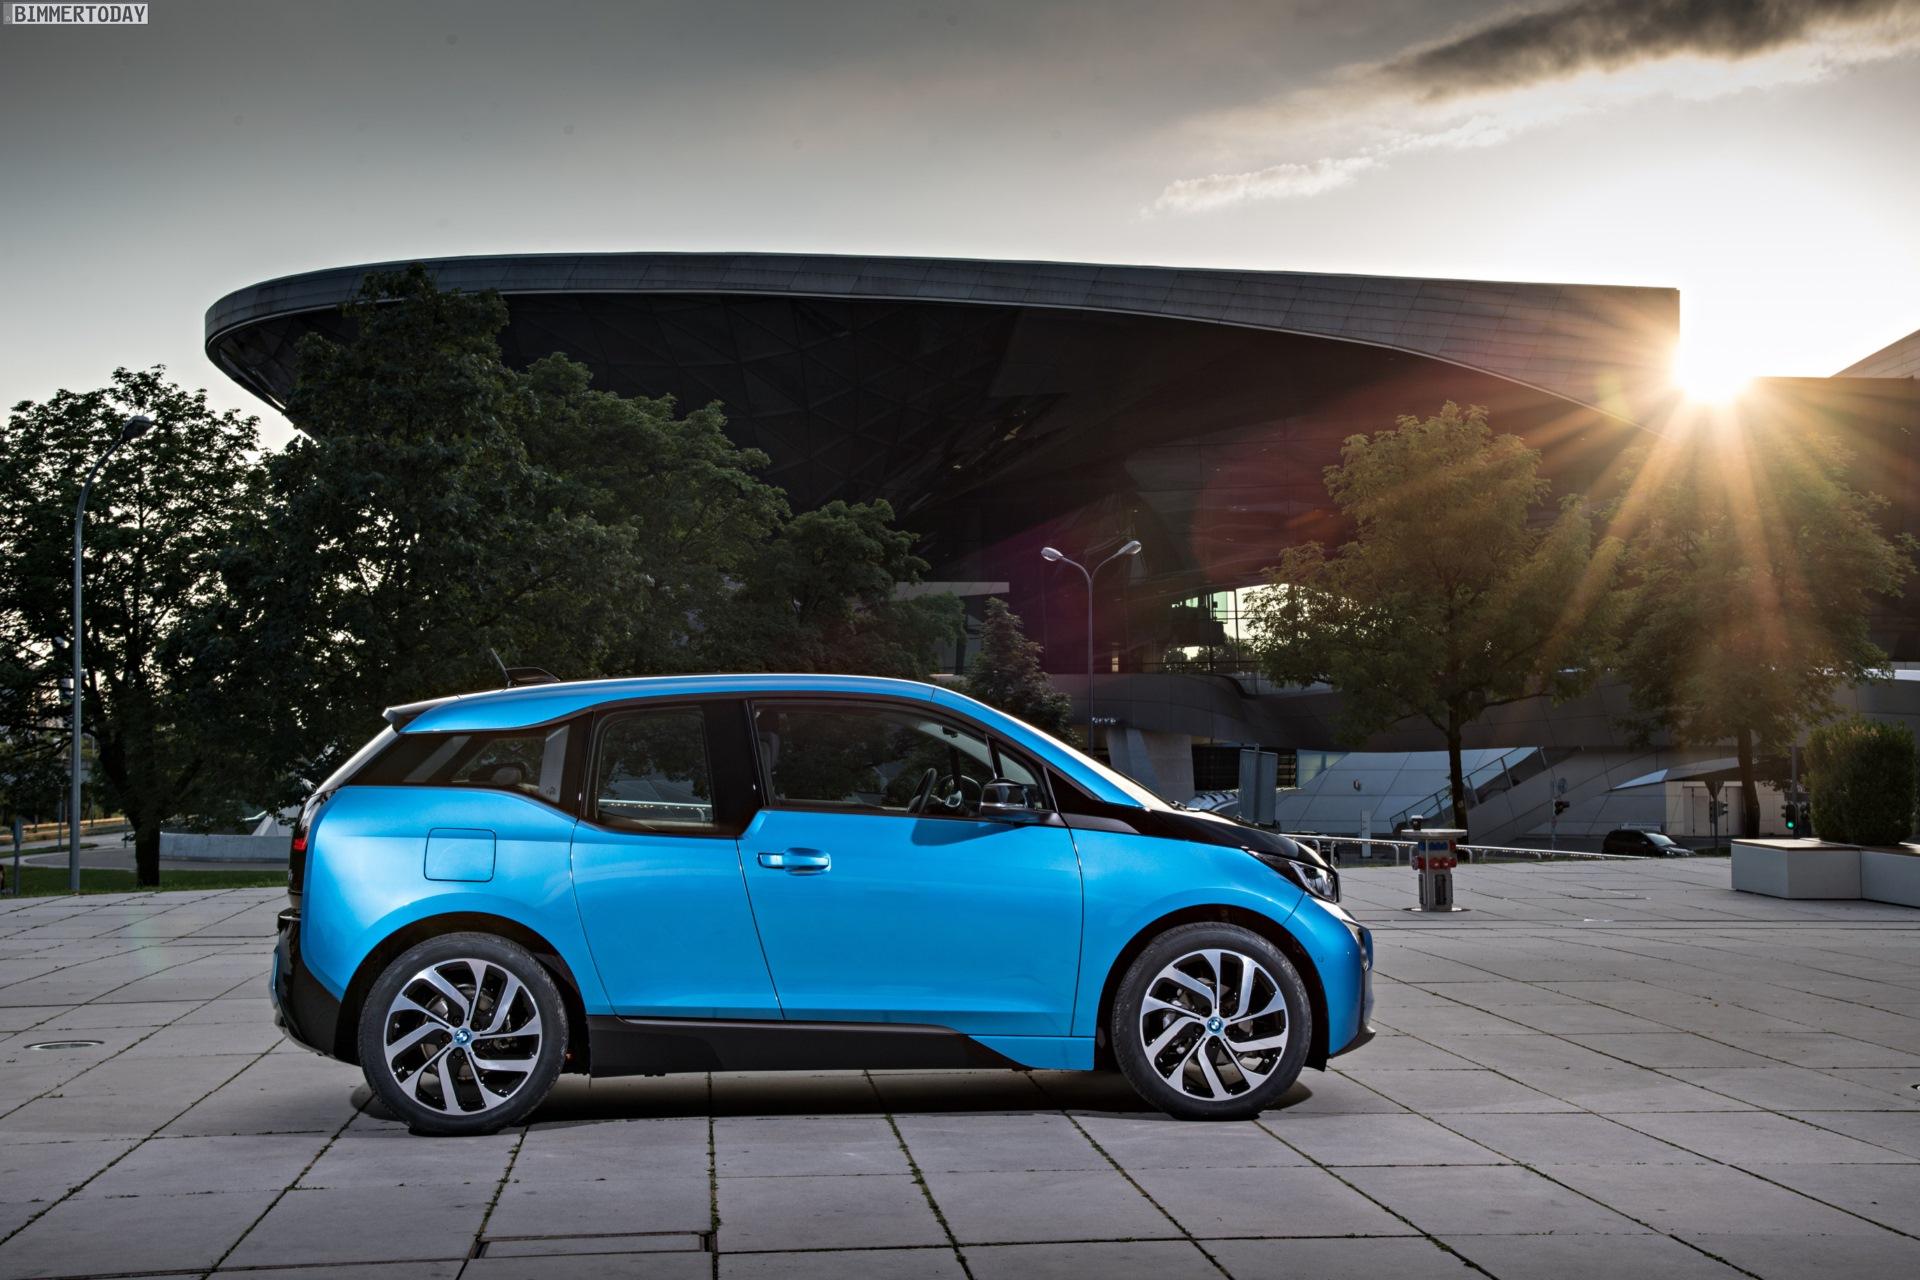 2016 BMW i3 94Ah Protonic Blue 33 kWh Elektroauto 22